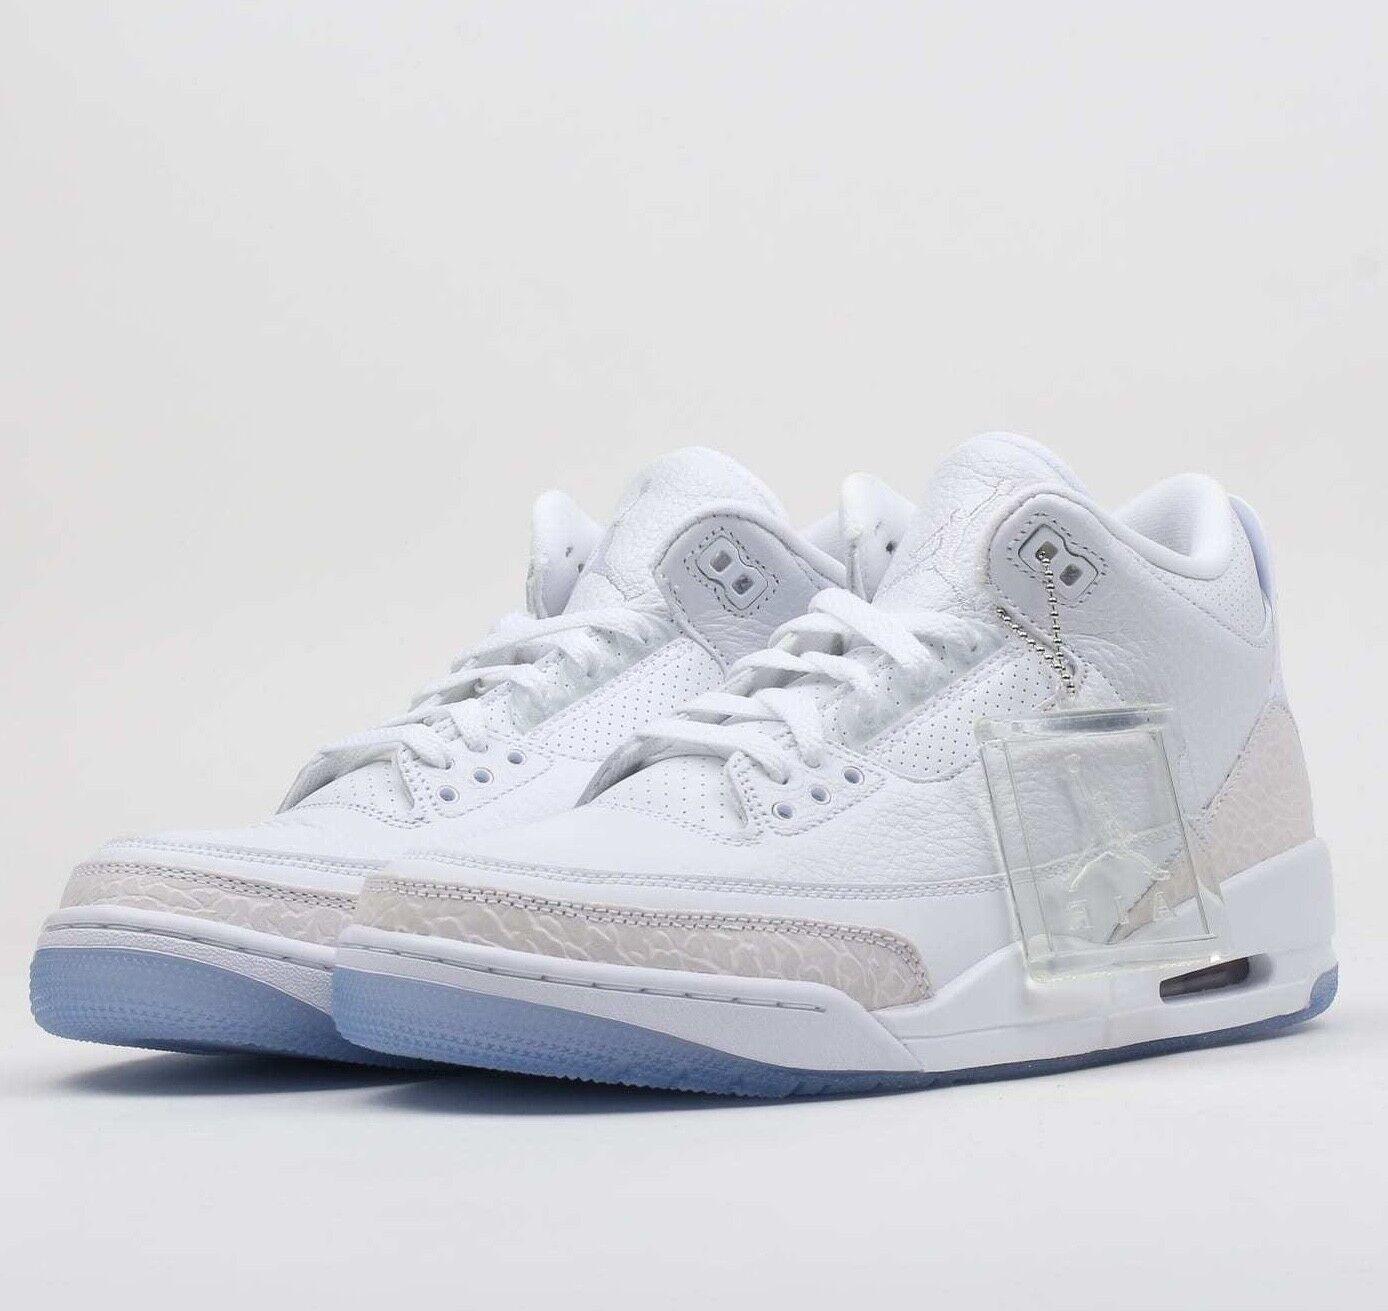 Air Jordan 3 Retro Pure bianca 136064-111 bianca-bianca Basketball Shoes NIB